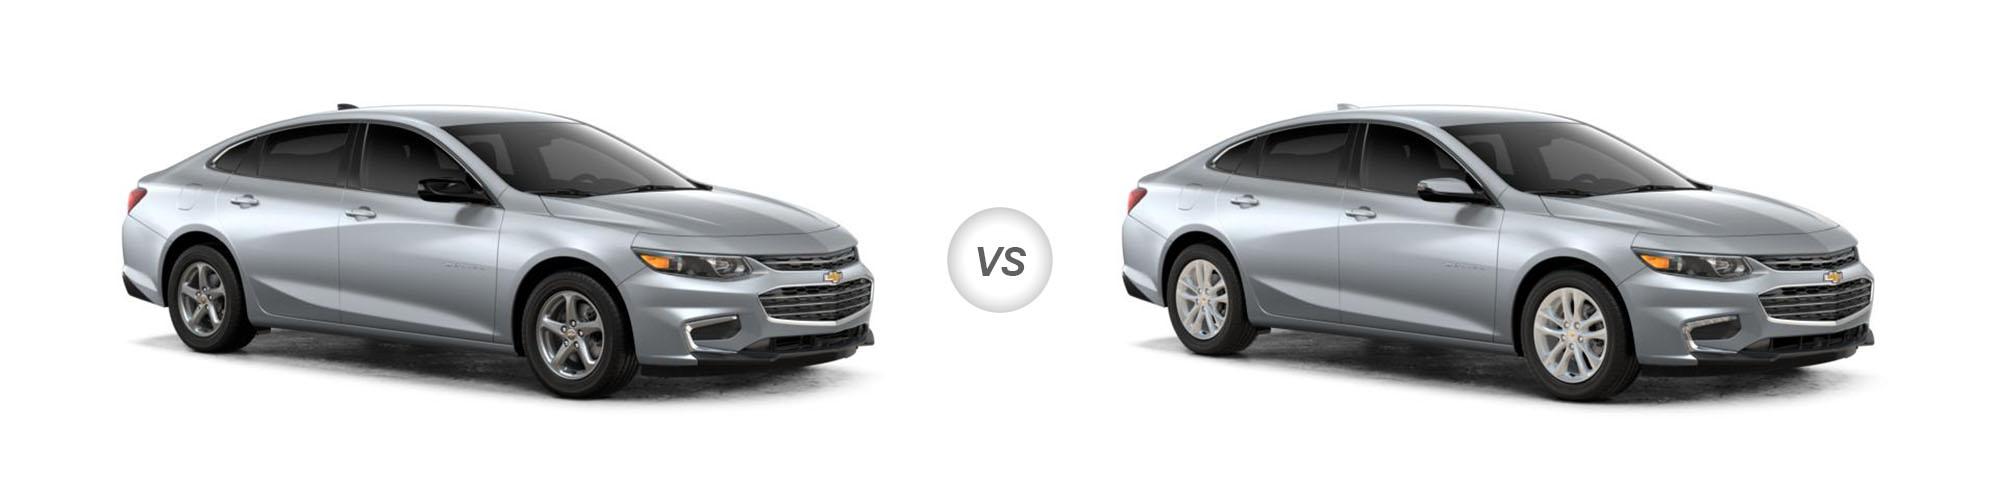 2018 Chevrolet Malibu LS vs Malibu LT   Trim Comparison